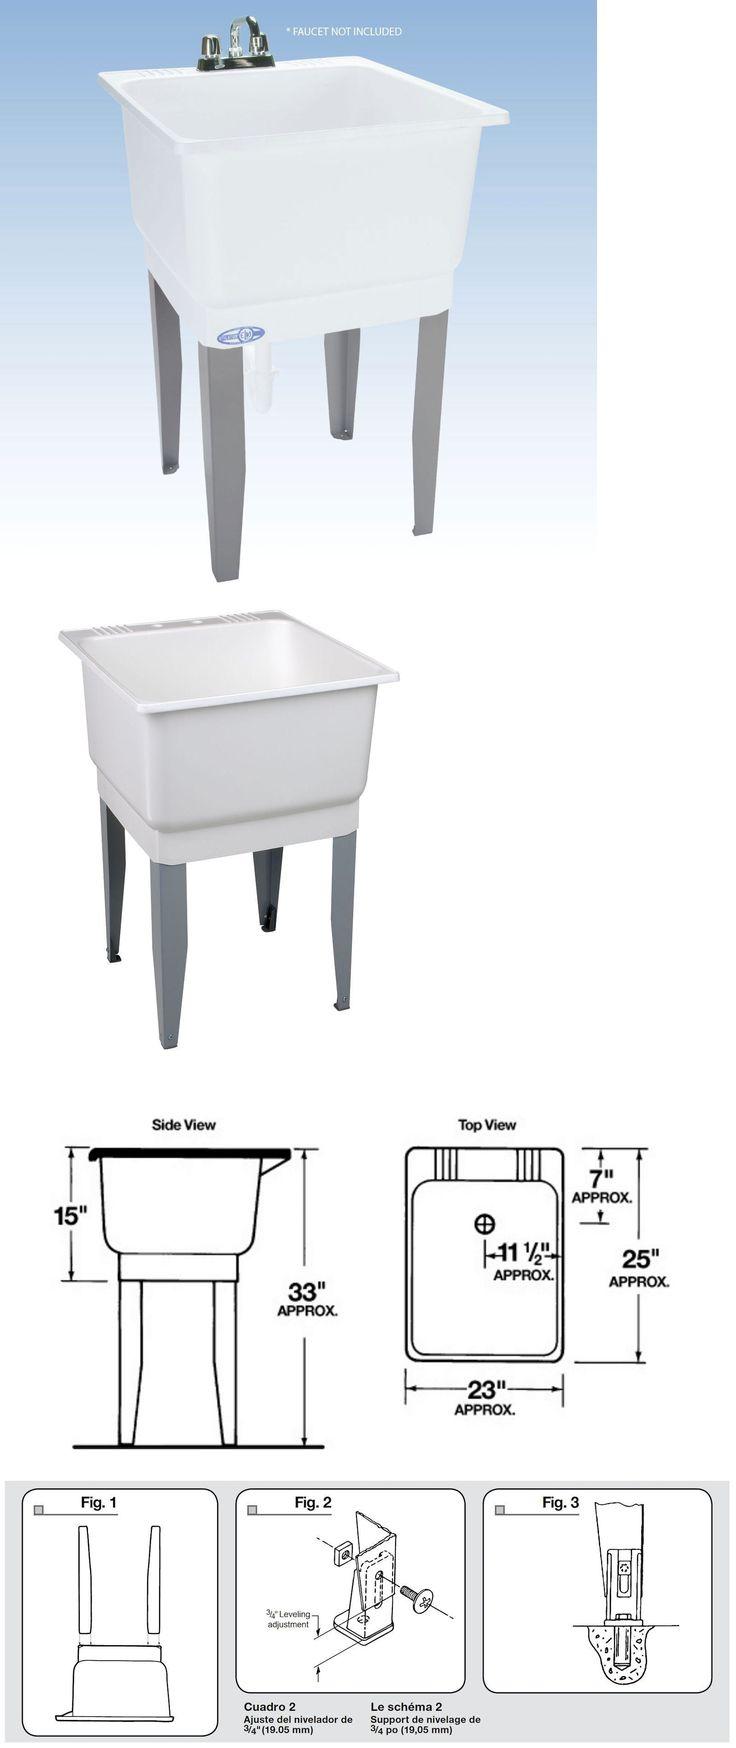 Laundry sink ebay - Sinks 71283 Freestanding Utility Sink Laundry Tub Floor Mount Single Faucet Wash Bowl Basin